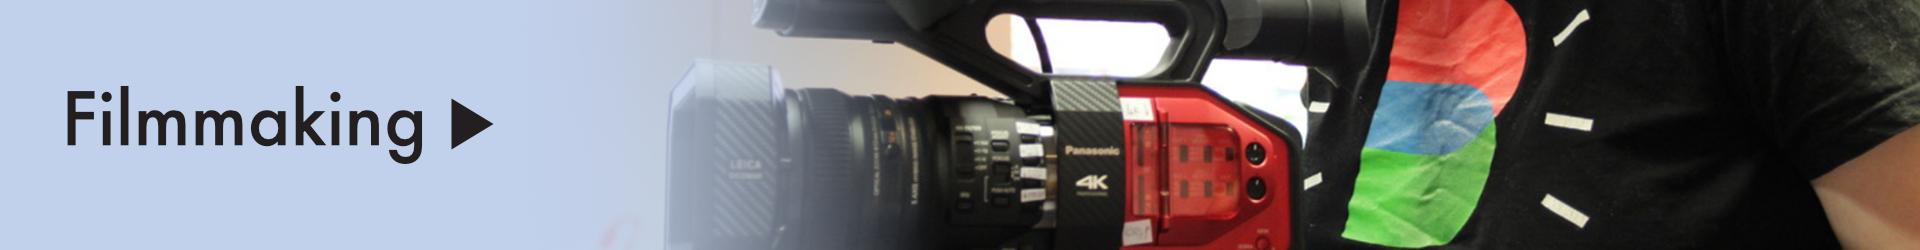 1. Filmmaking.jpg